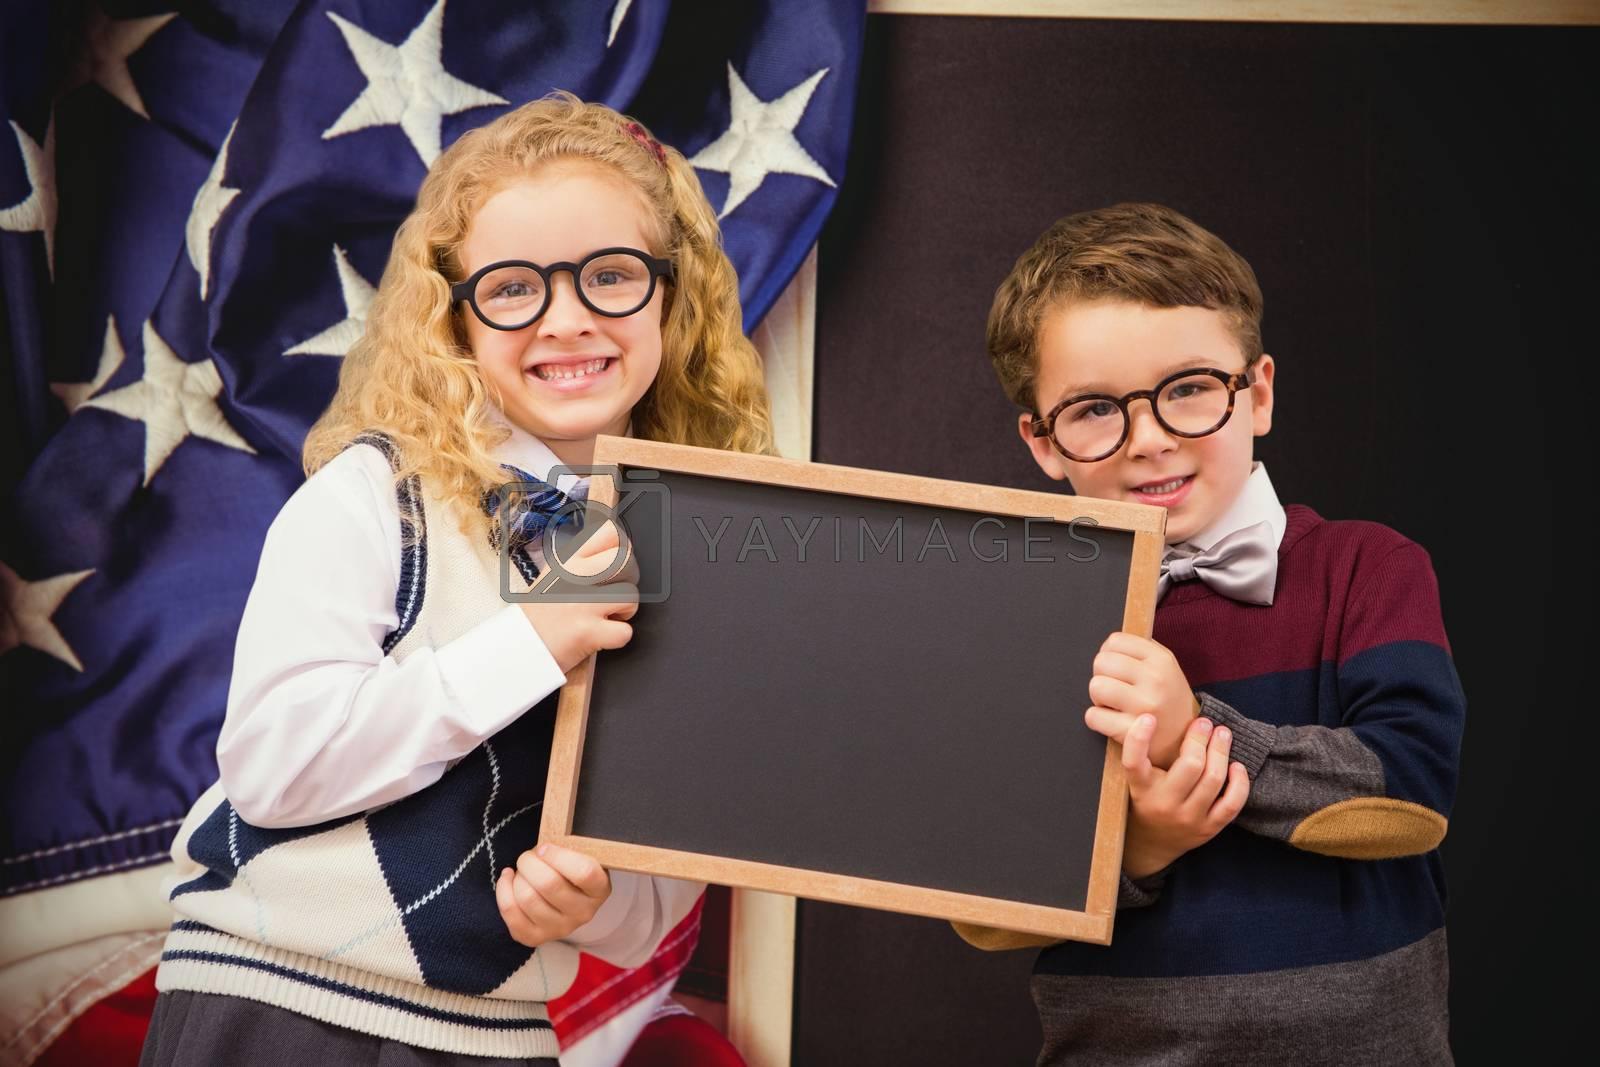 Pupils showing chalkboard against american flag on chalkboard